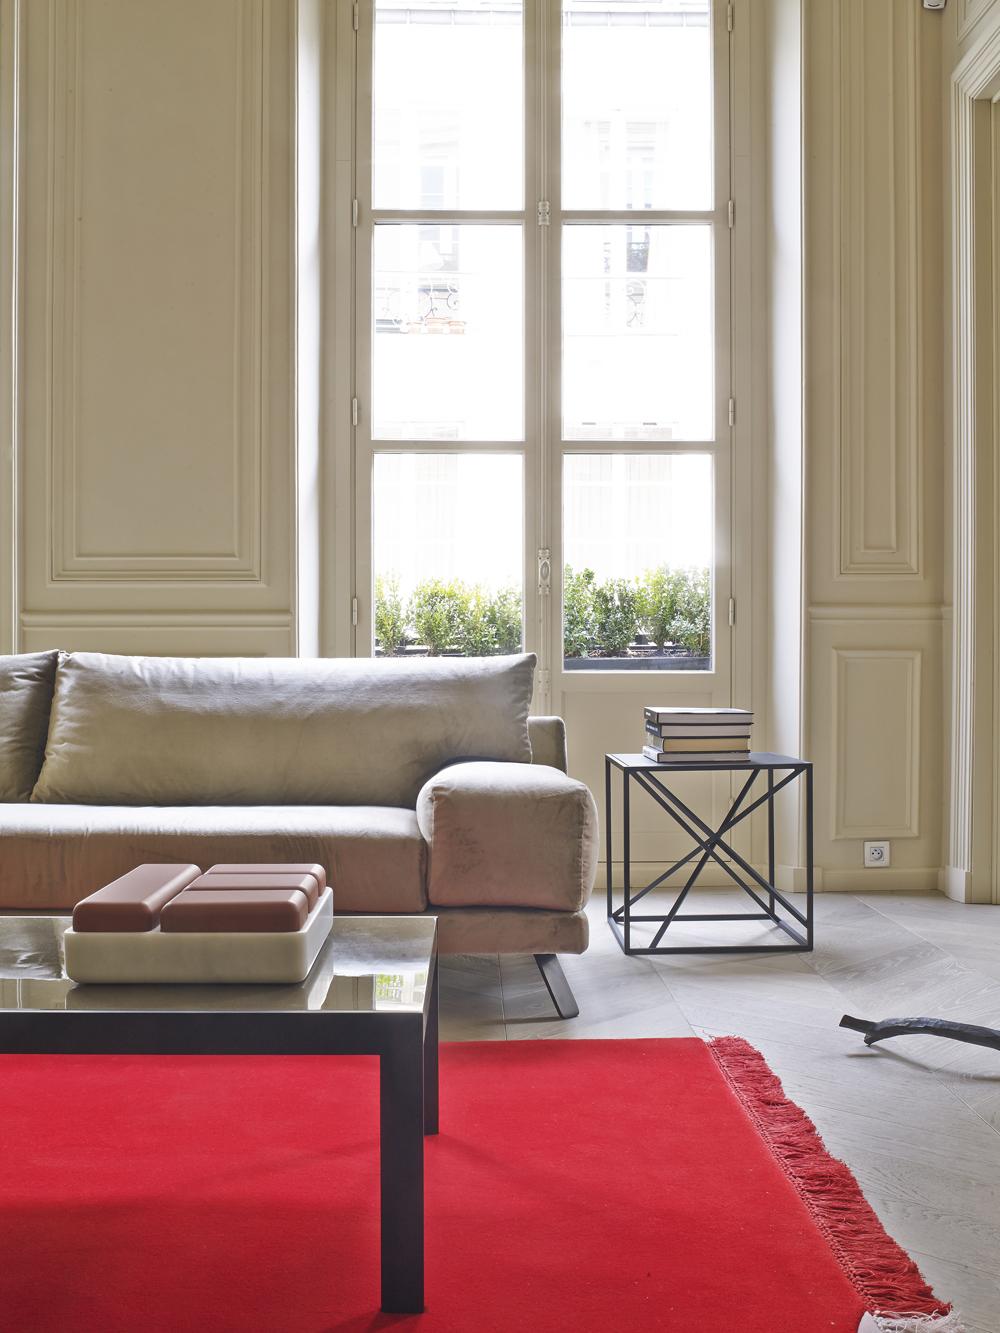 christophe-delcourt-interior-inspiration-5.jpg